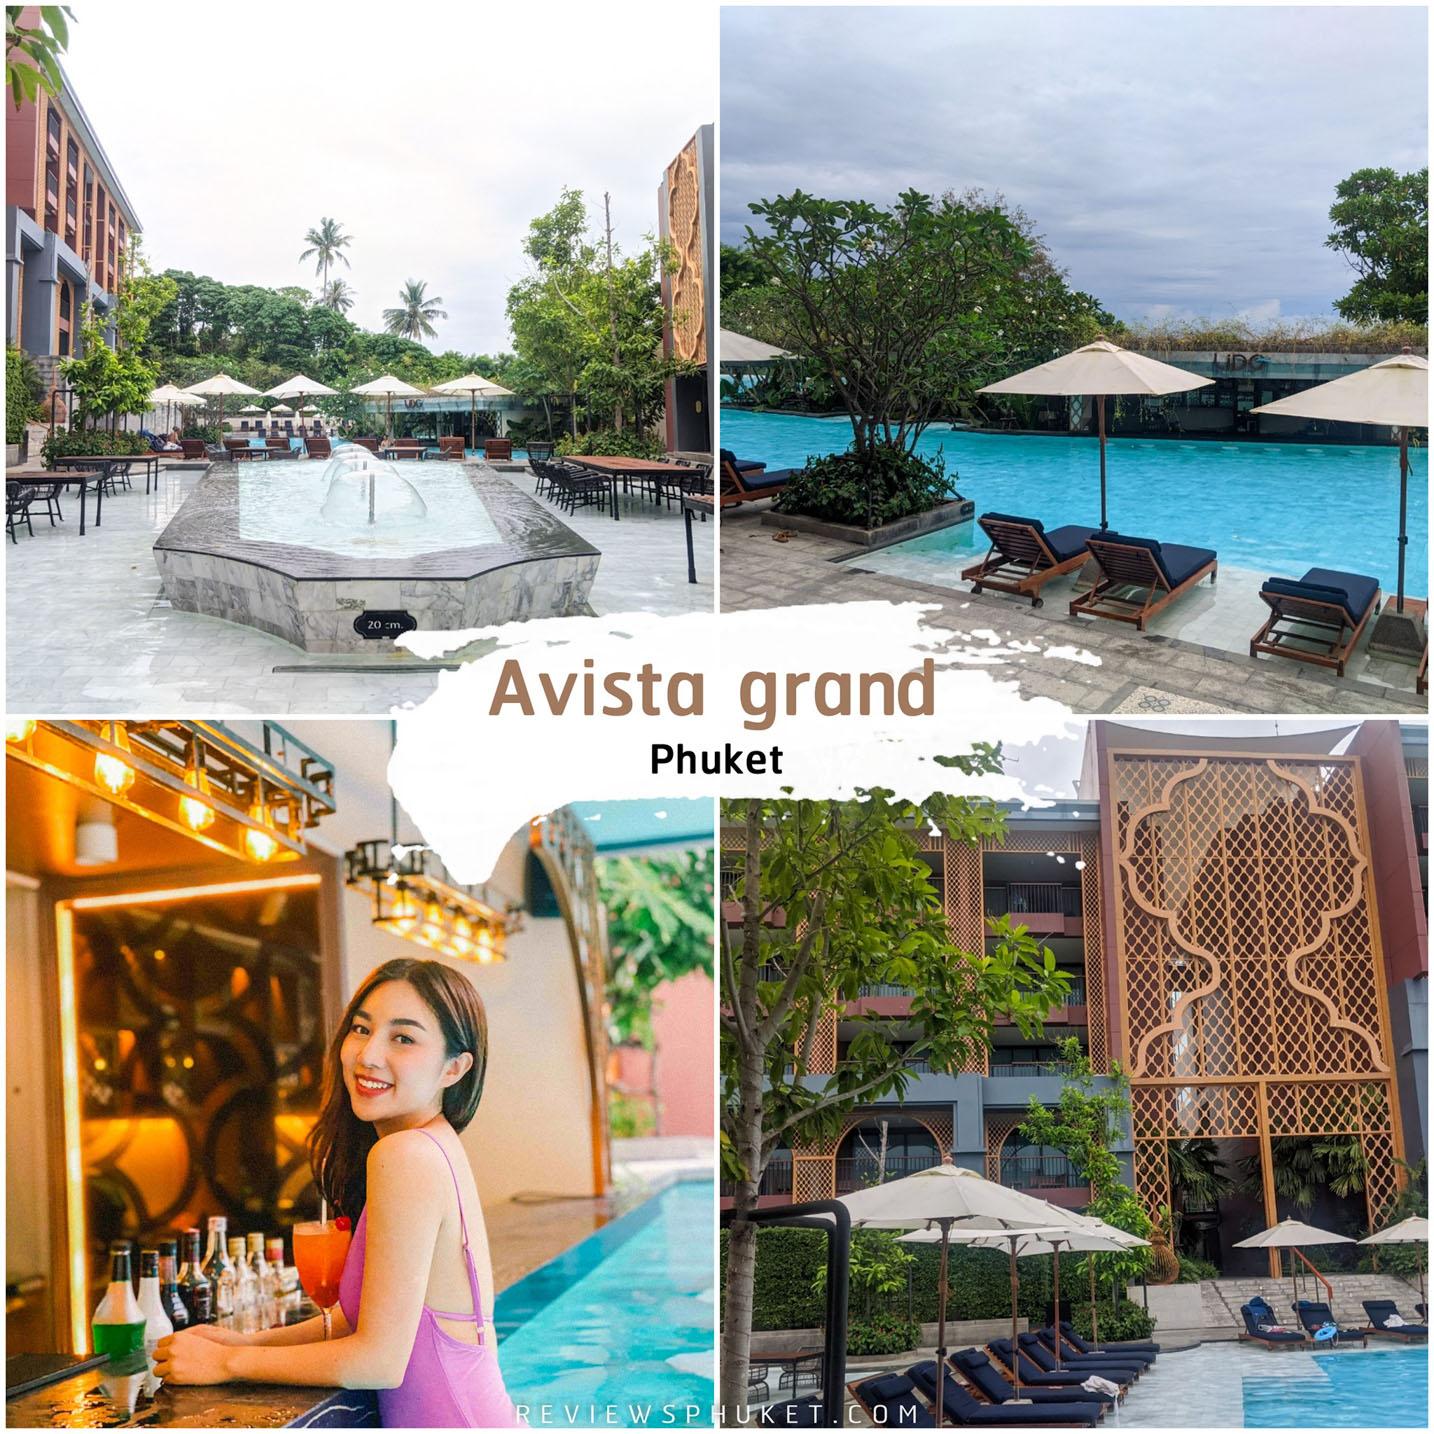 Avista Grande Phuket Karon ที่พักภูเก็ตออกแบบมีสไตล์ ด้วยสถาปัตยกรรมเมืองเก่าภูเก็ต